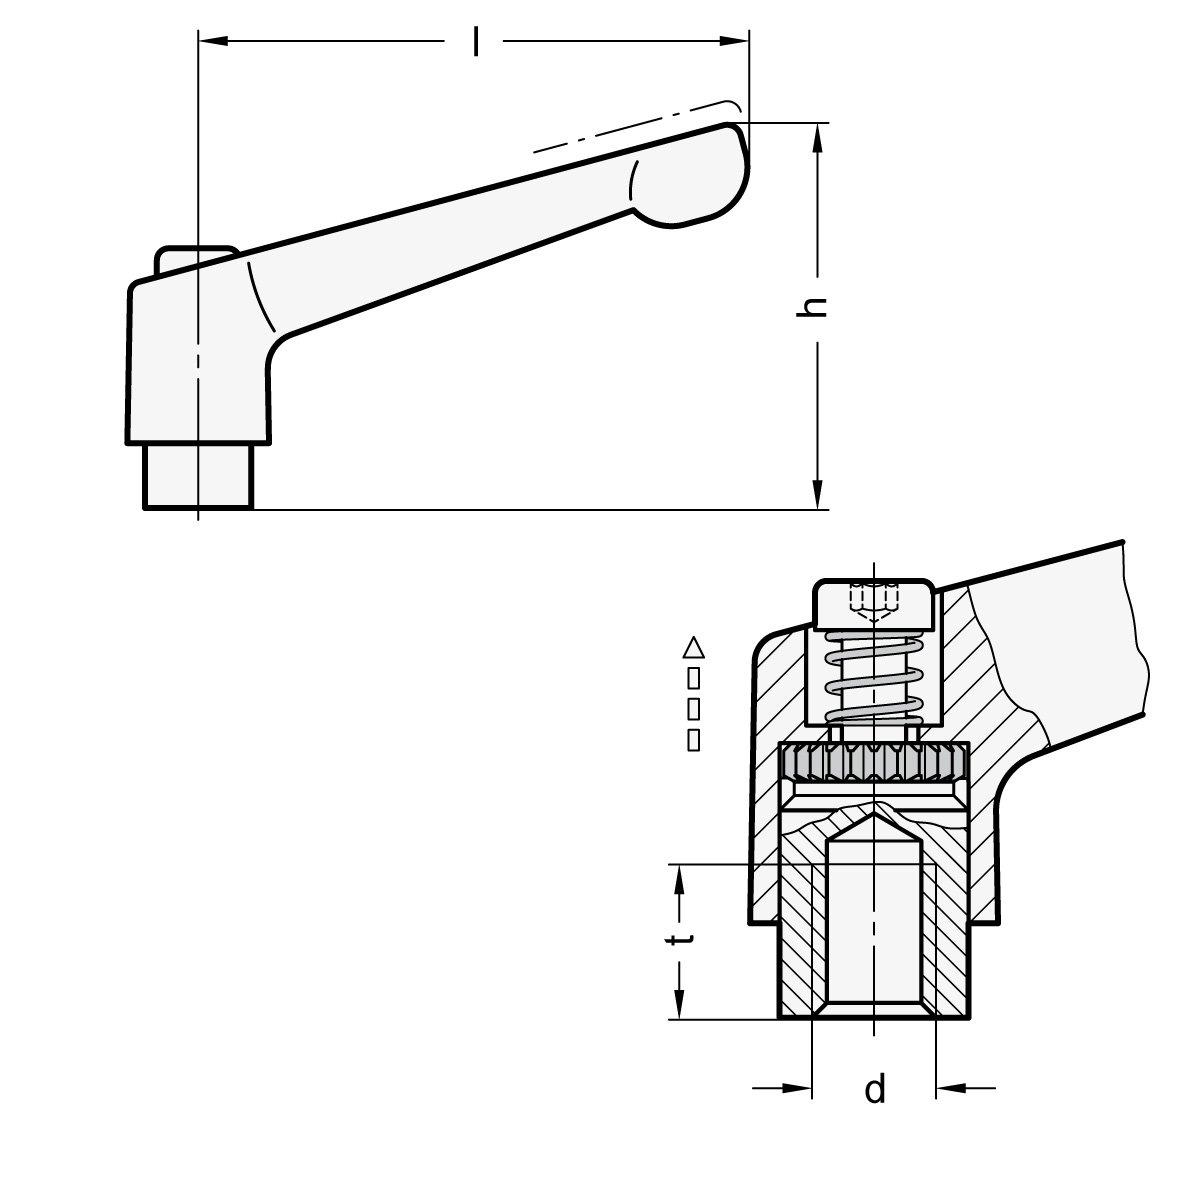 Strukturmatt Black Ganter Standard Elements Adjustable Clamping Lever with M12/Stainless Steel Threaded Sleeves GN 300.1/108/SW